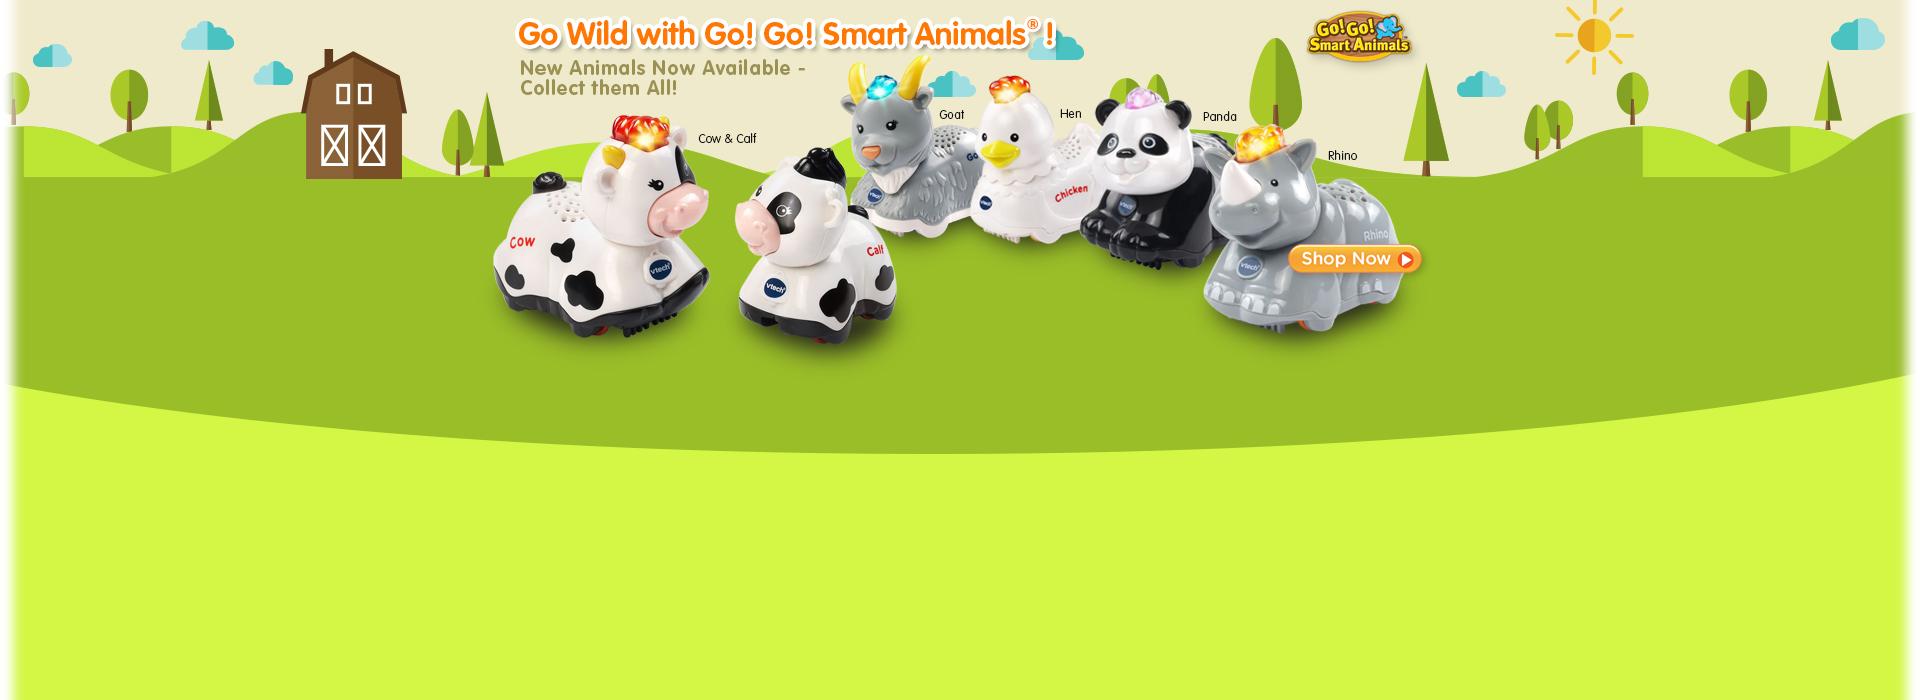 New Go! Go! Smart Animals Available!